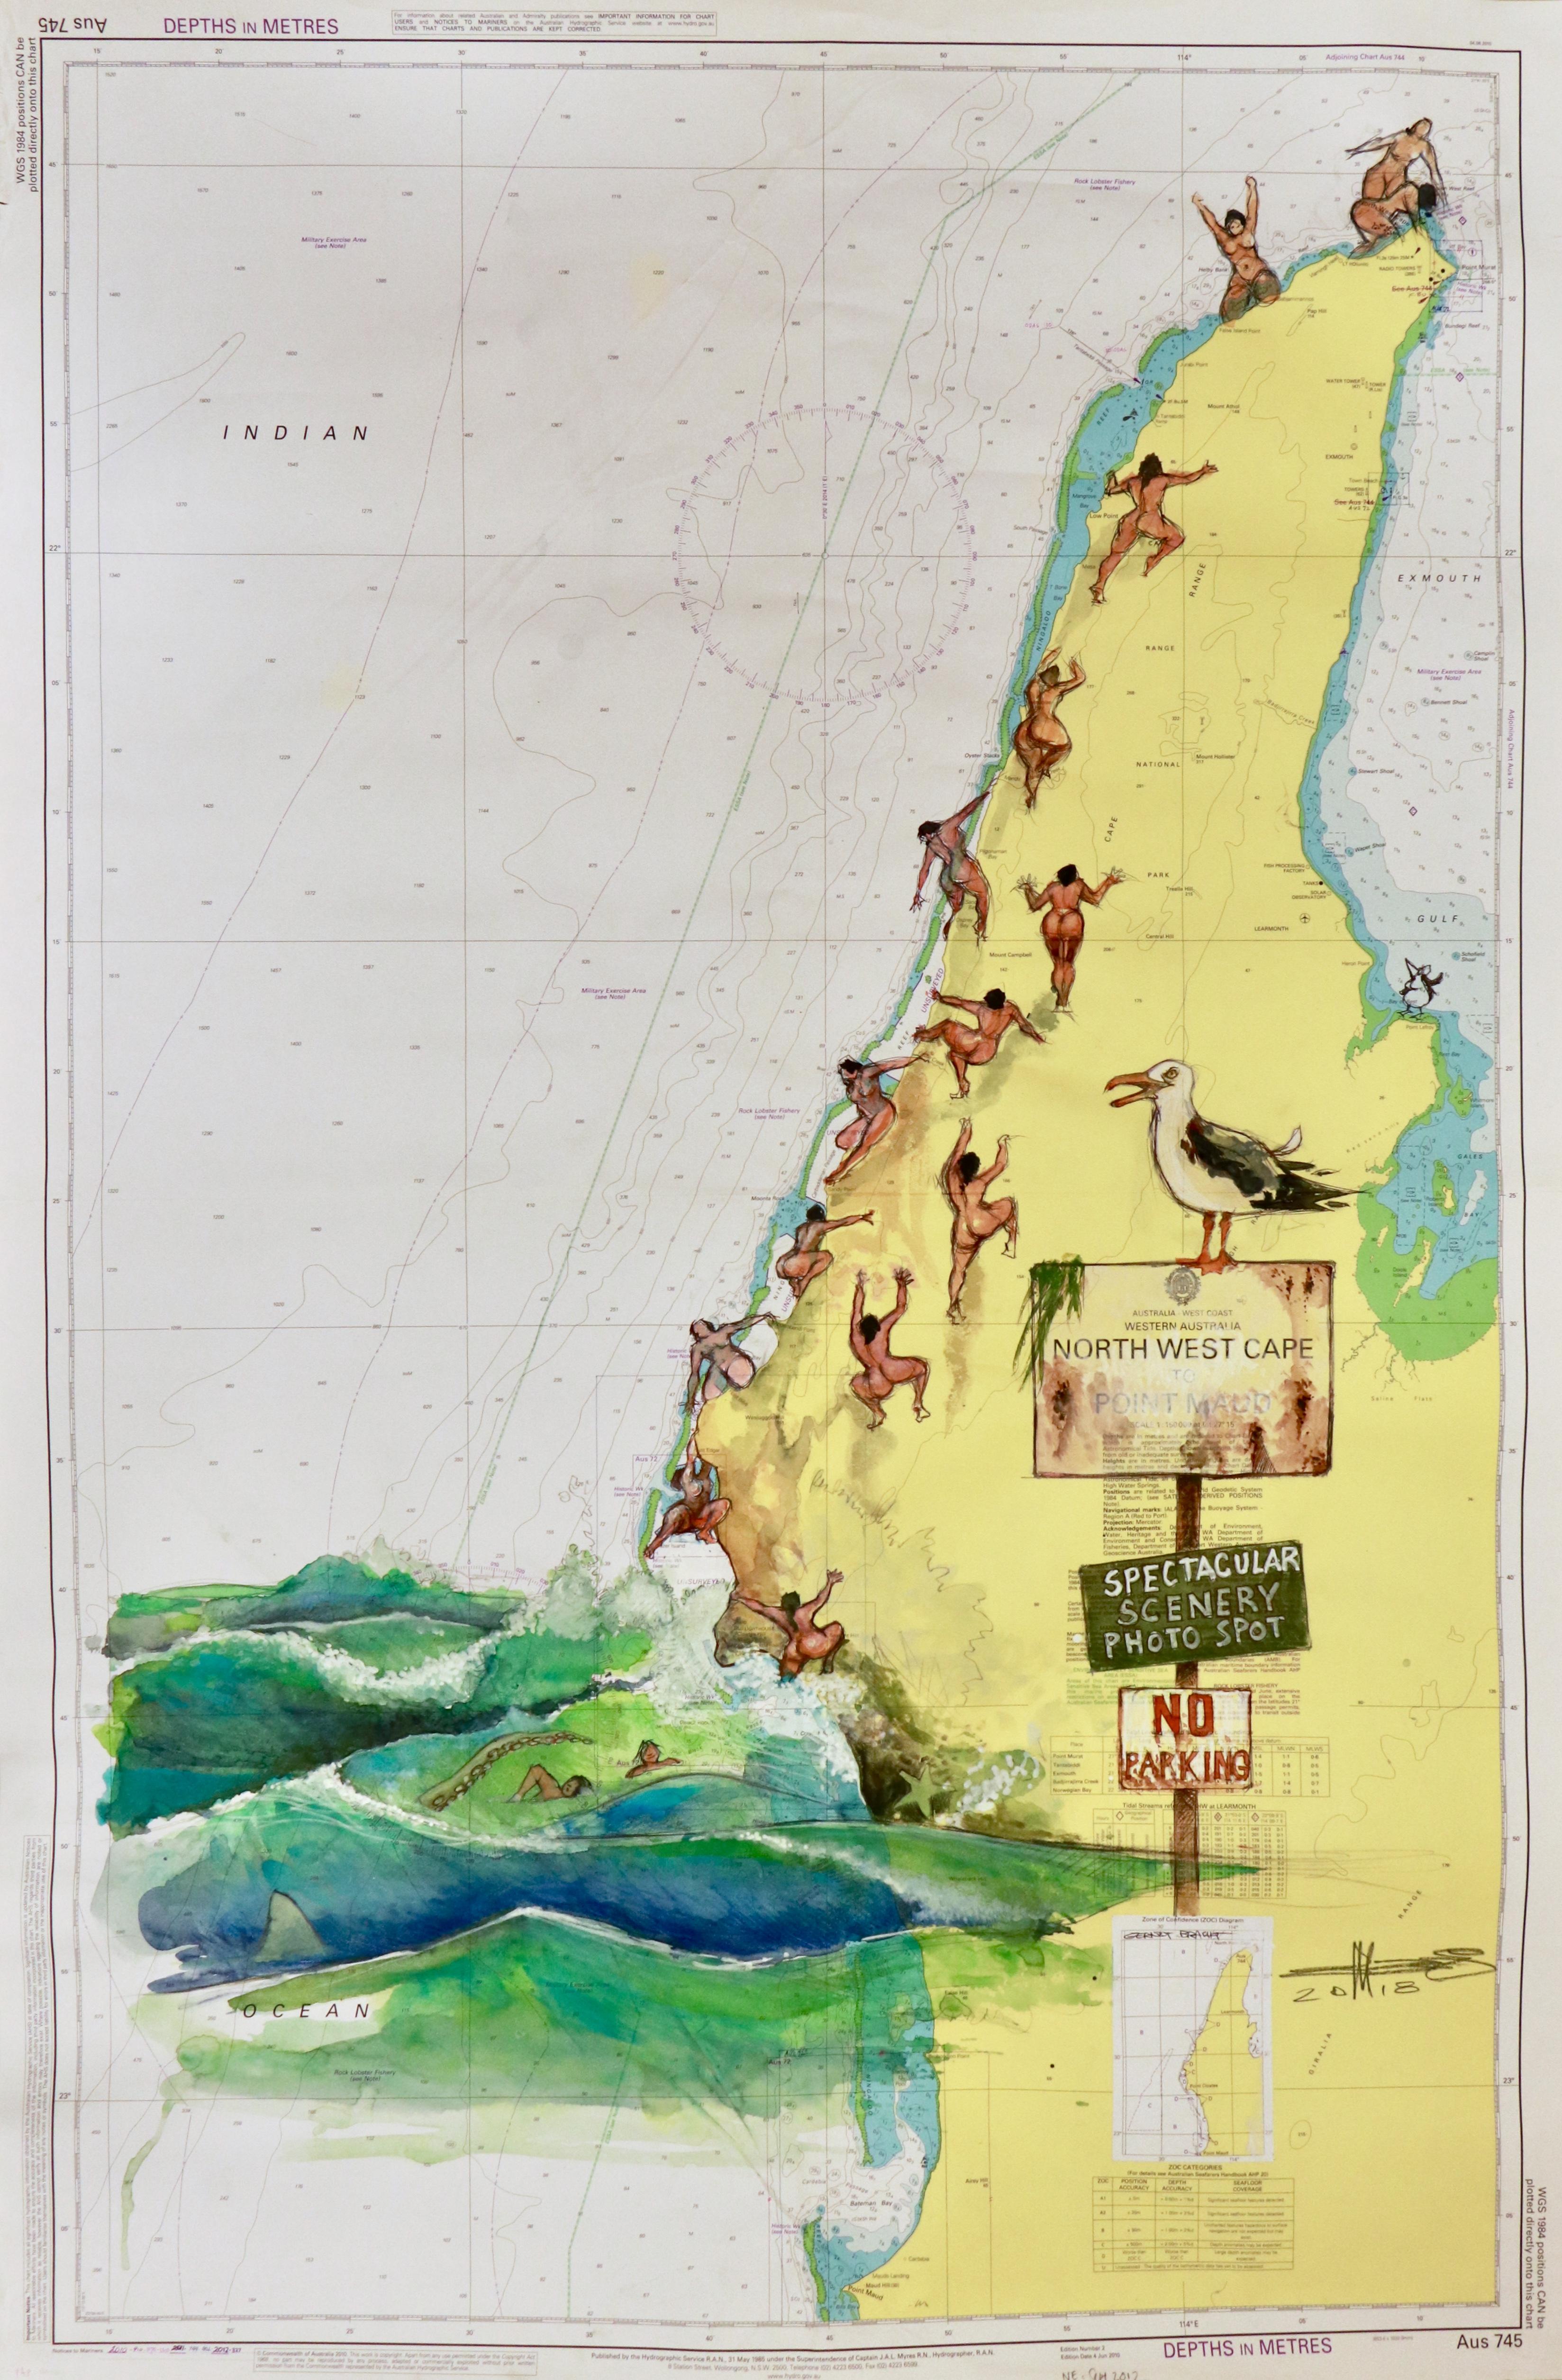 40 - Gernot Bracht - North West Cape to Point Maud